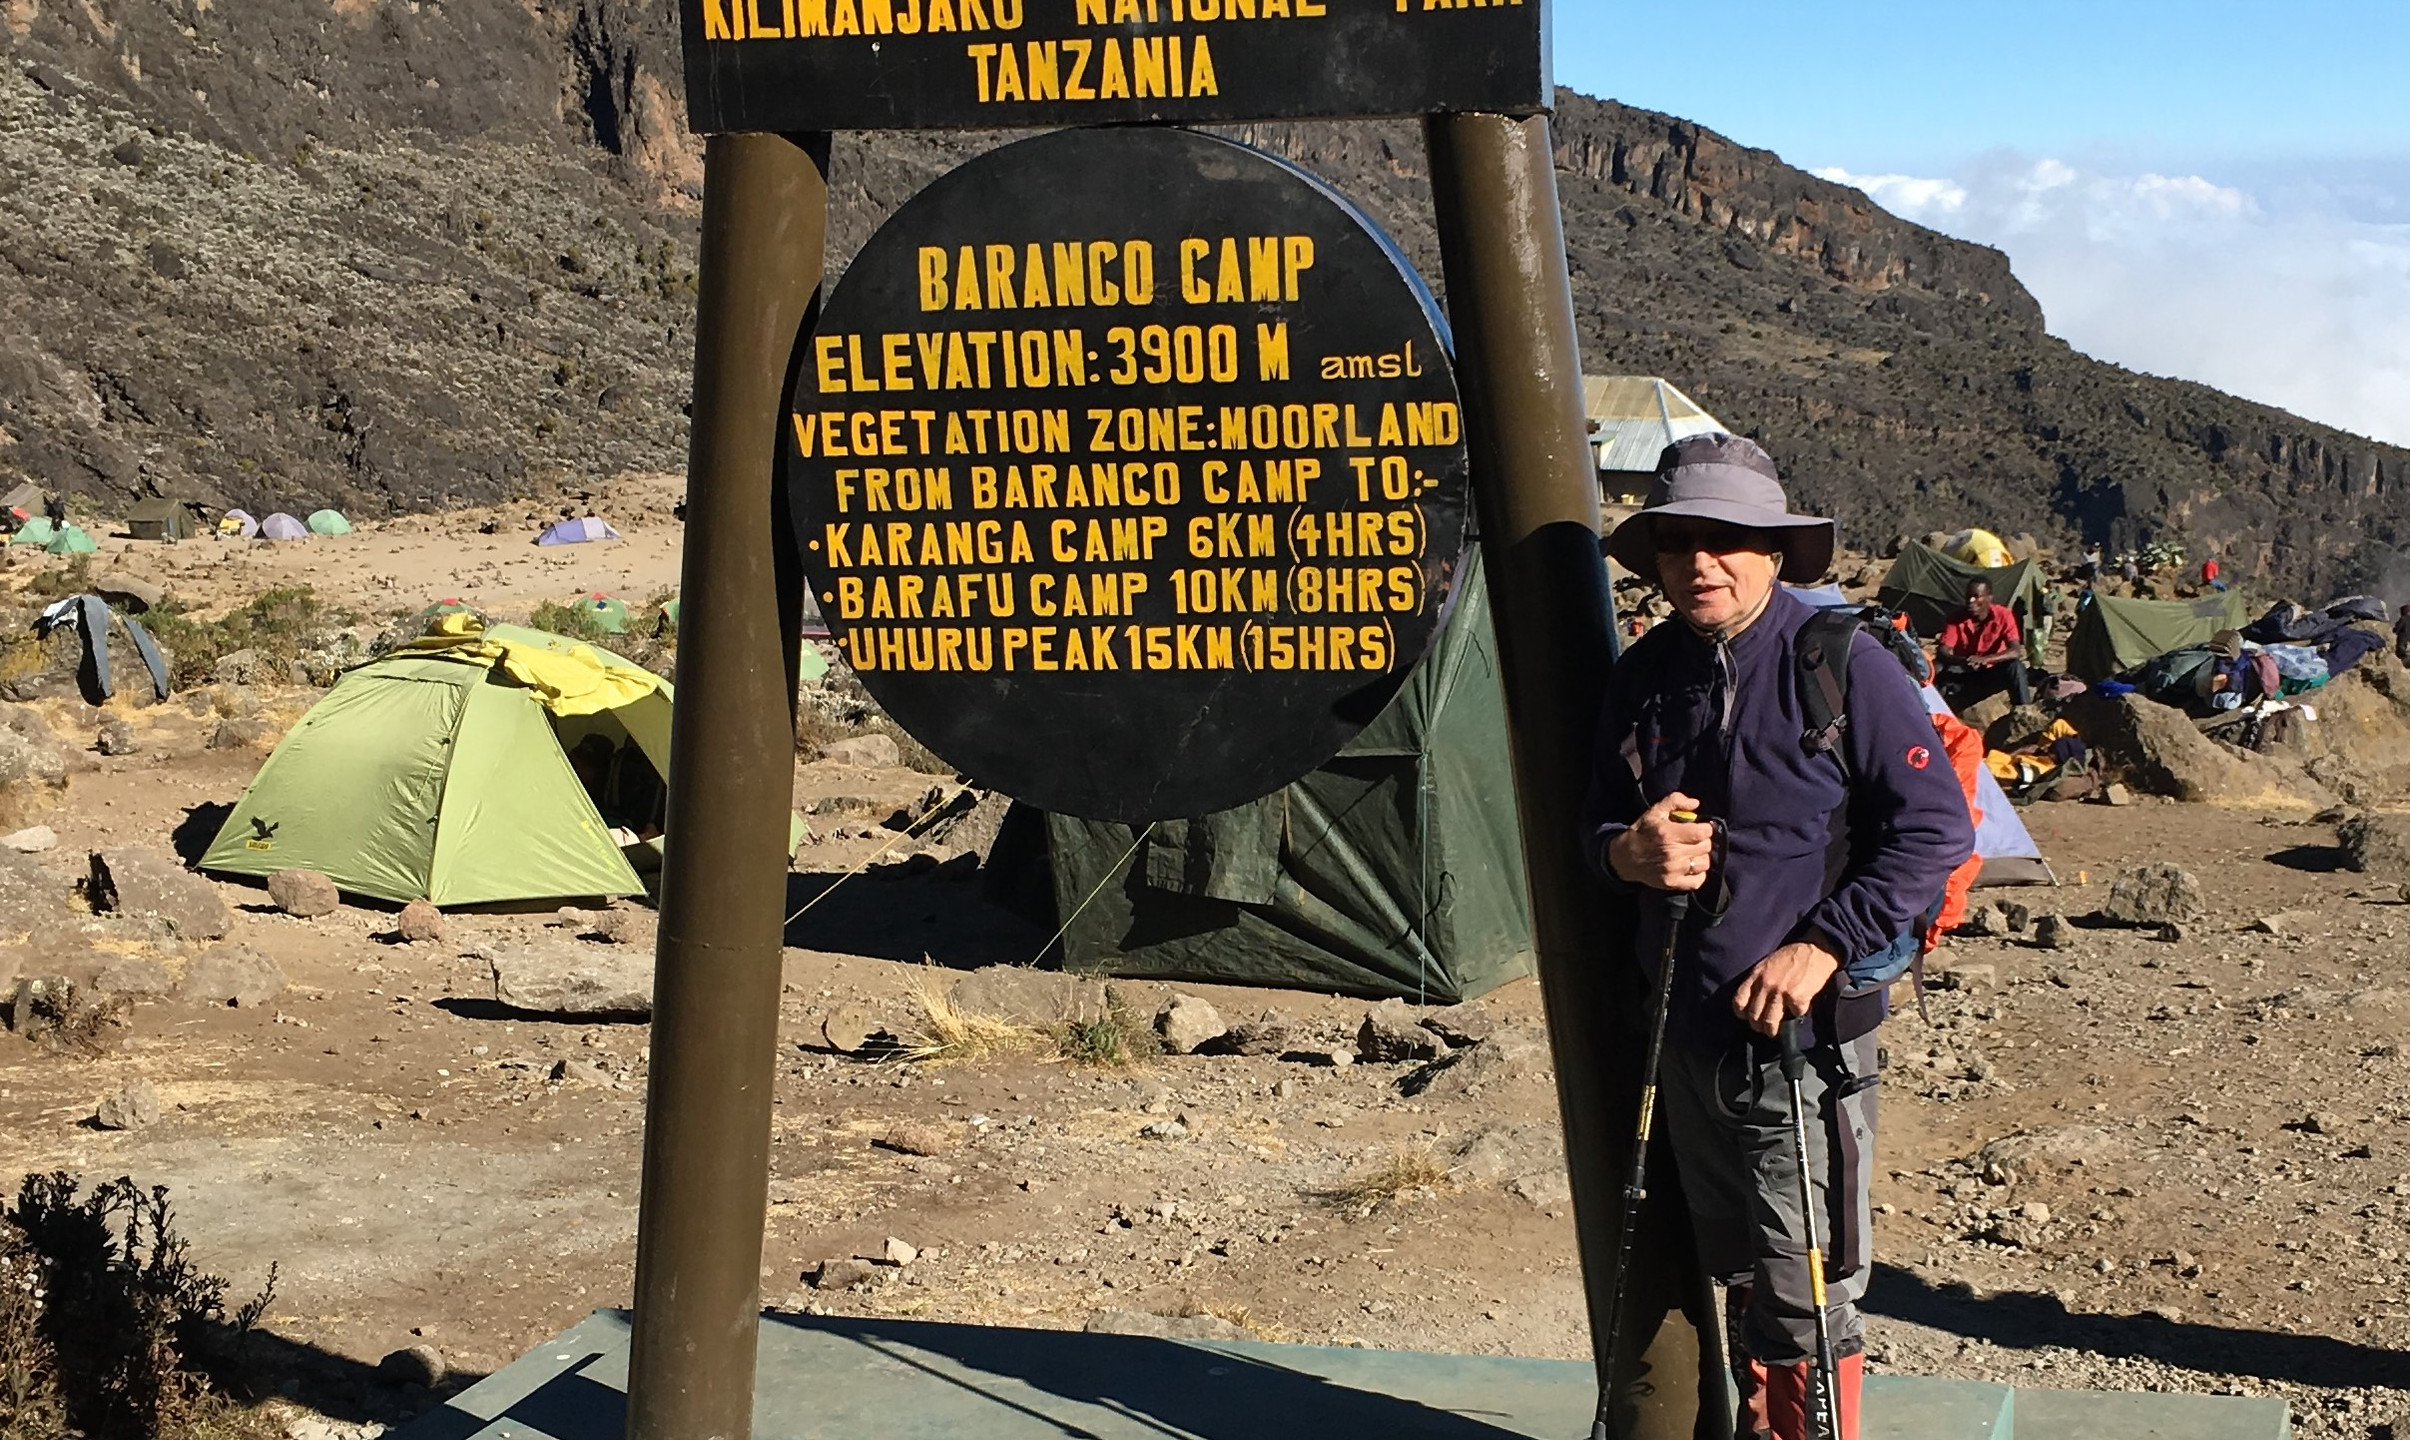 Лагерь Баранко — Baranco camp — Килиманджаро